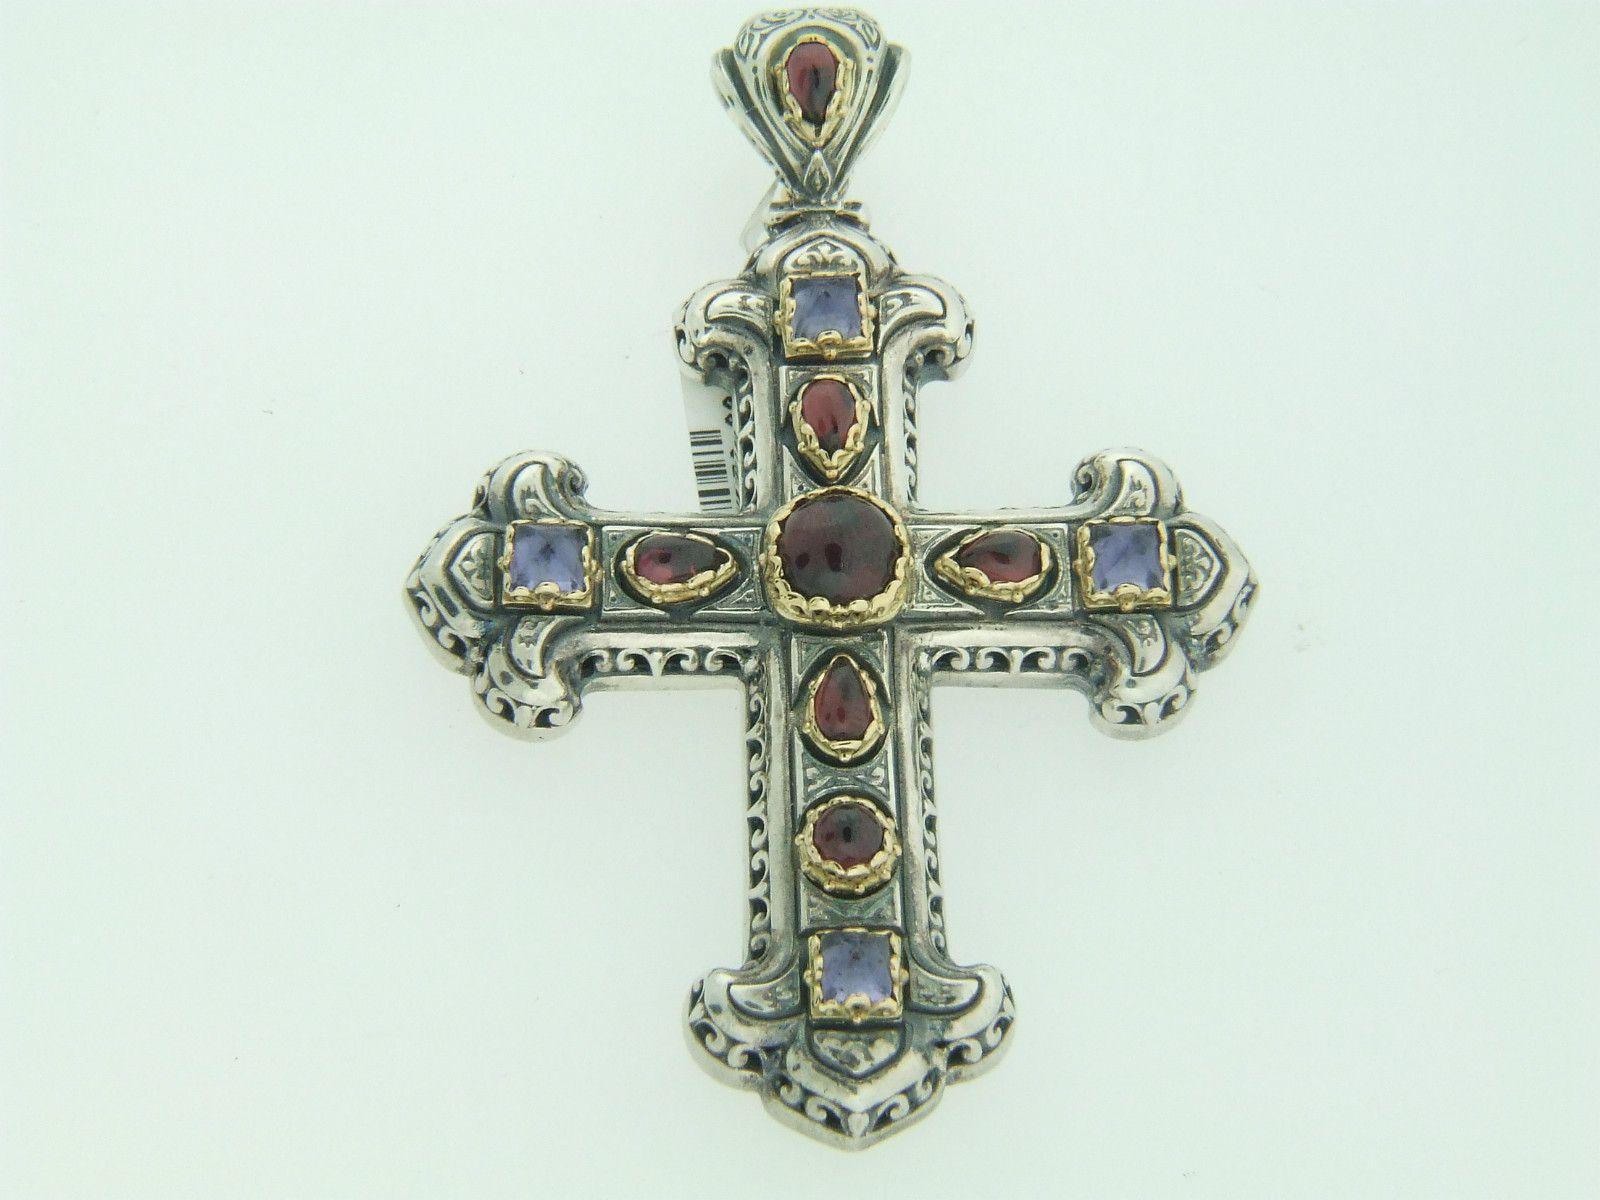 Konstantino Large Jeweled Cross Pendant - Google Search